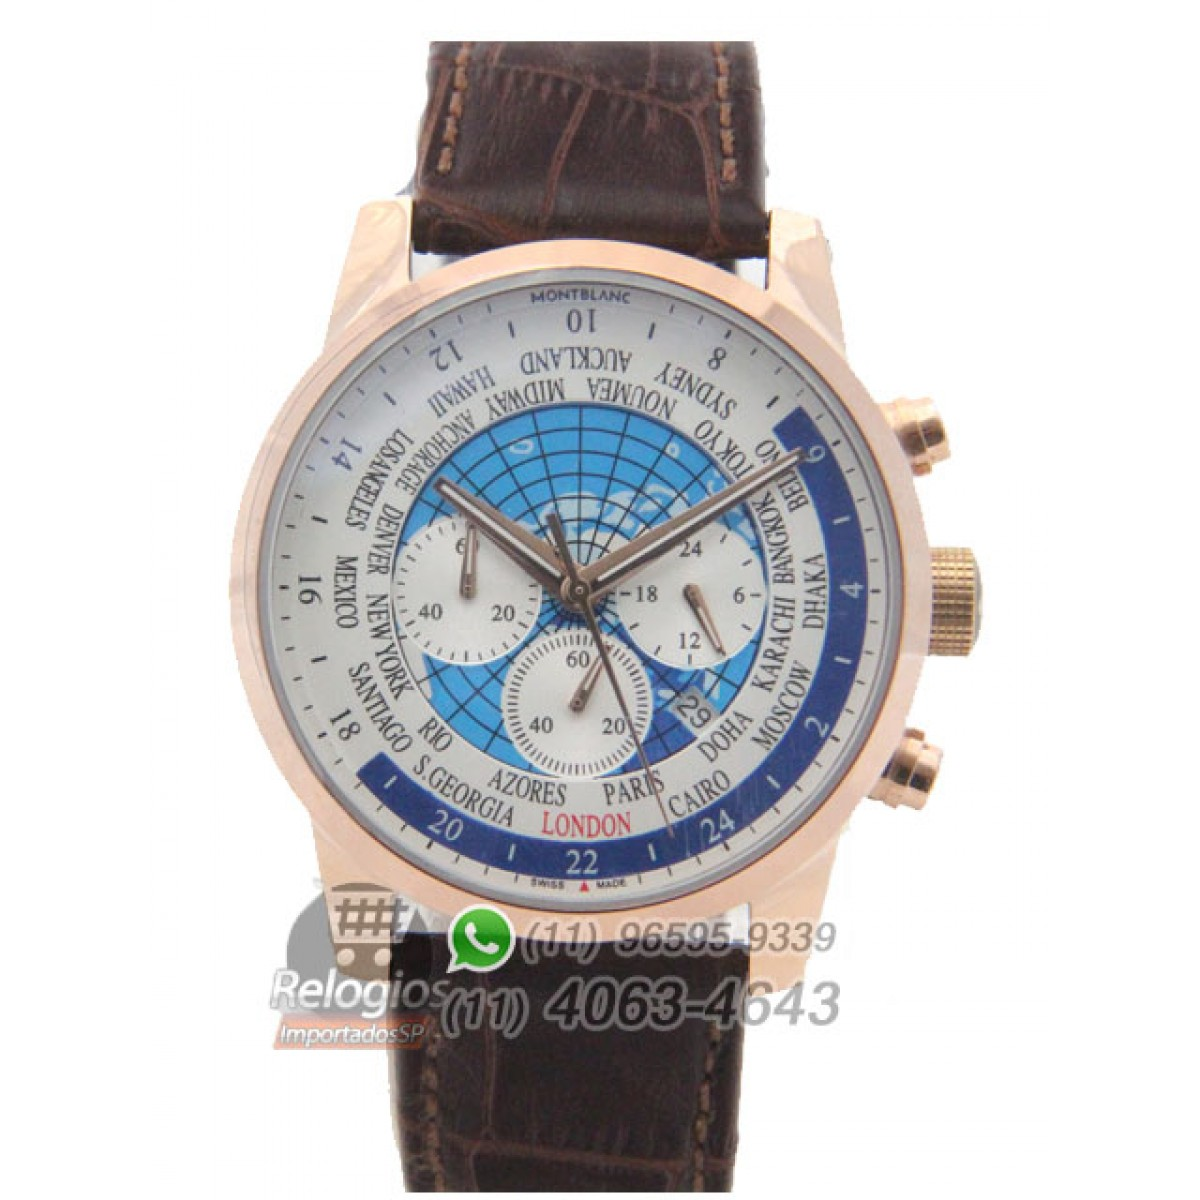 bb3e2e2ad3b Espiar · Relógio Réplica Montblanc Chronograph Mundial